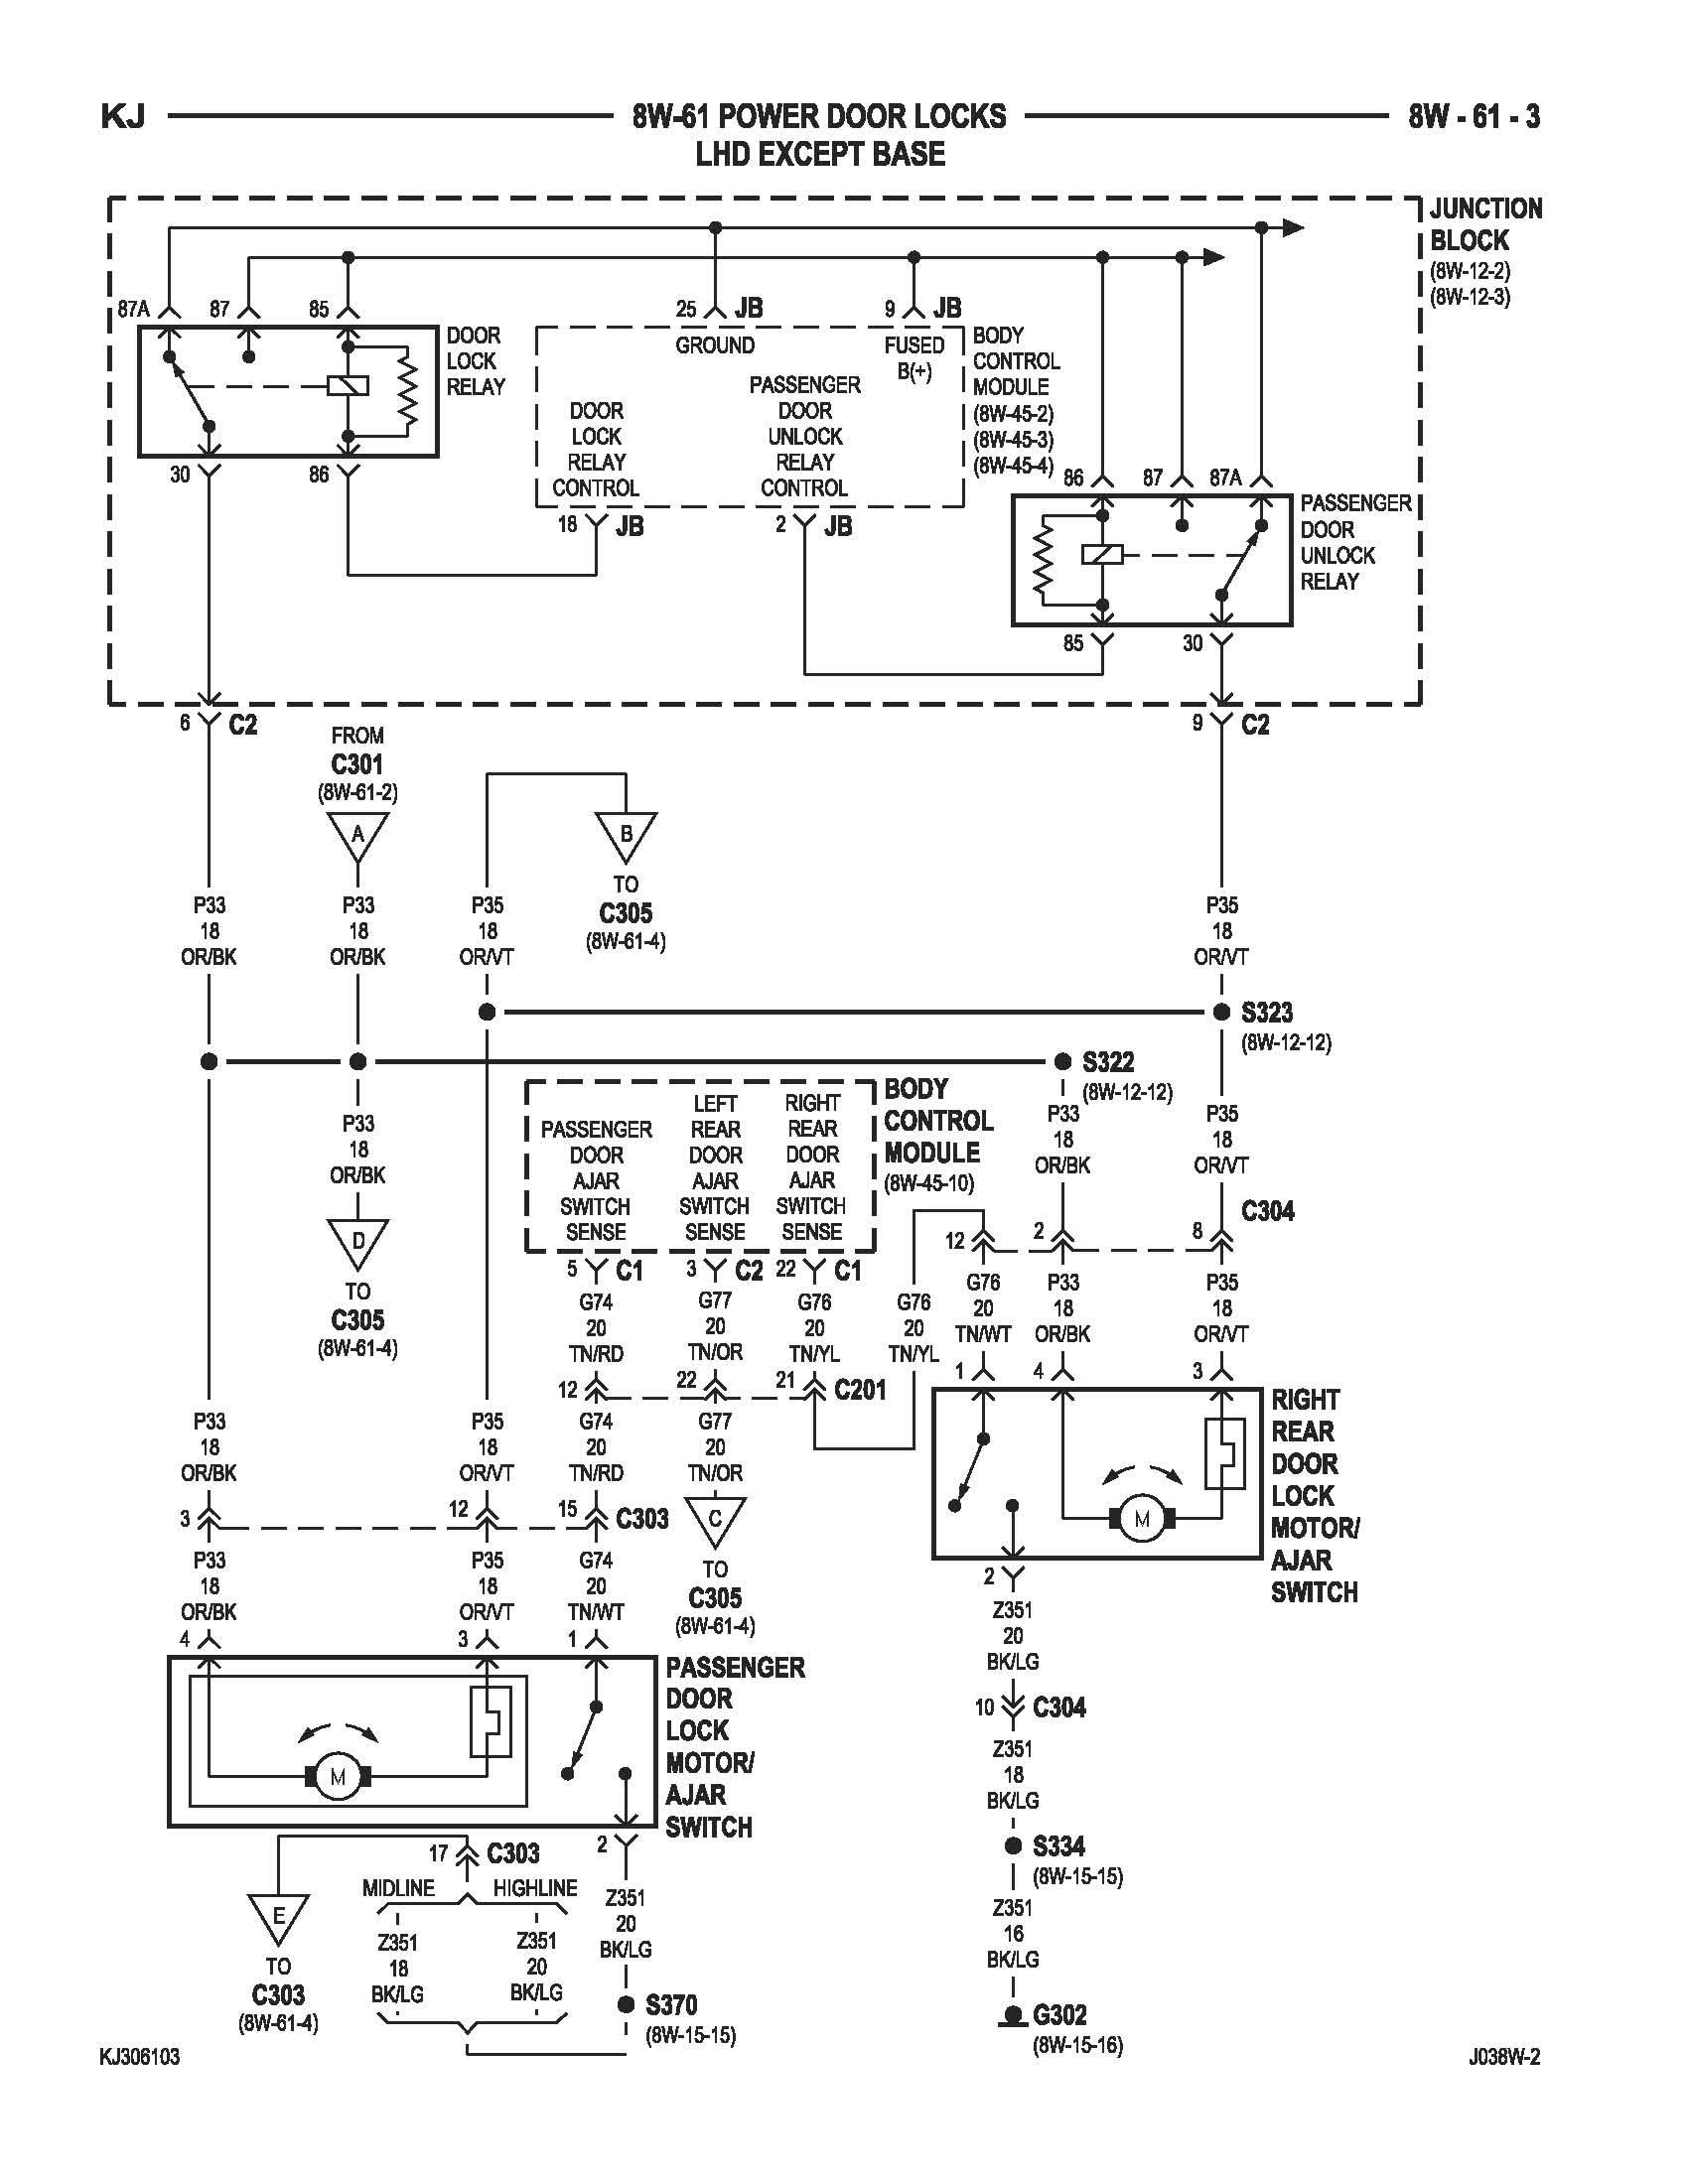 Fuse Box Diagram 2008 Jeep Wrangler Unlimited - Wiring Diagram